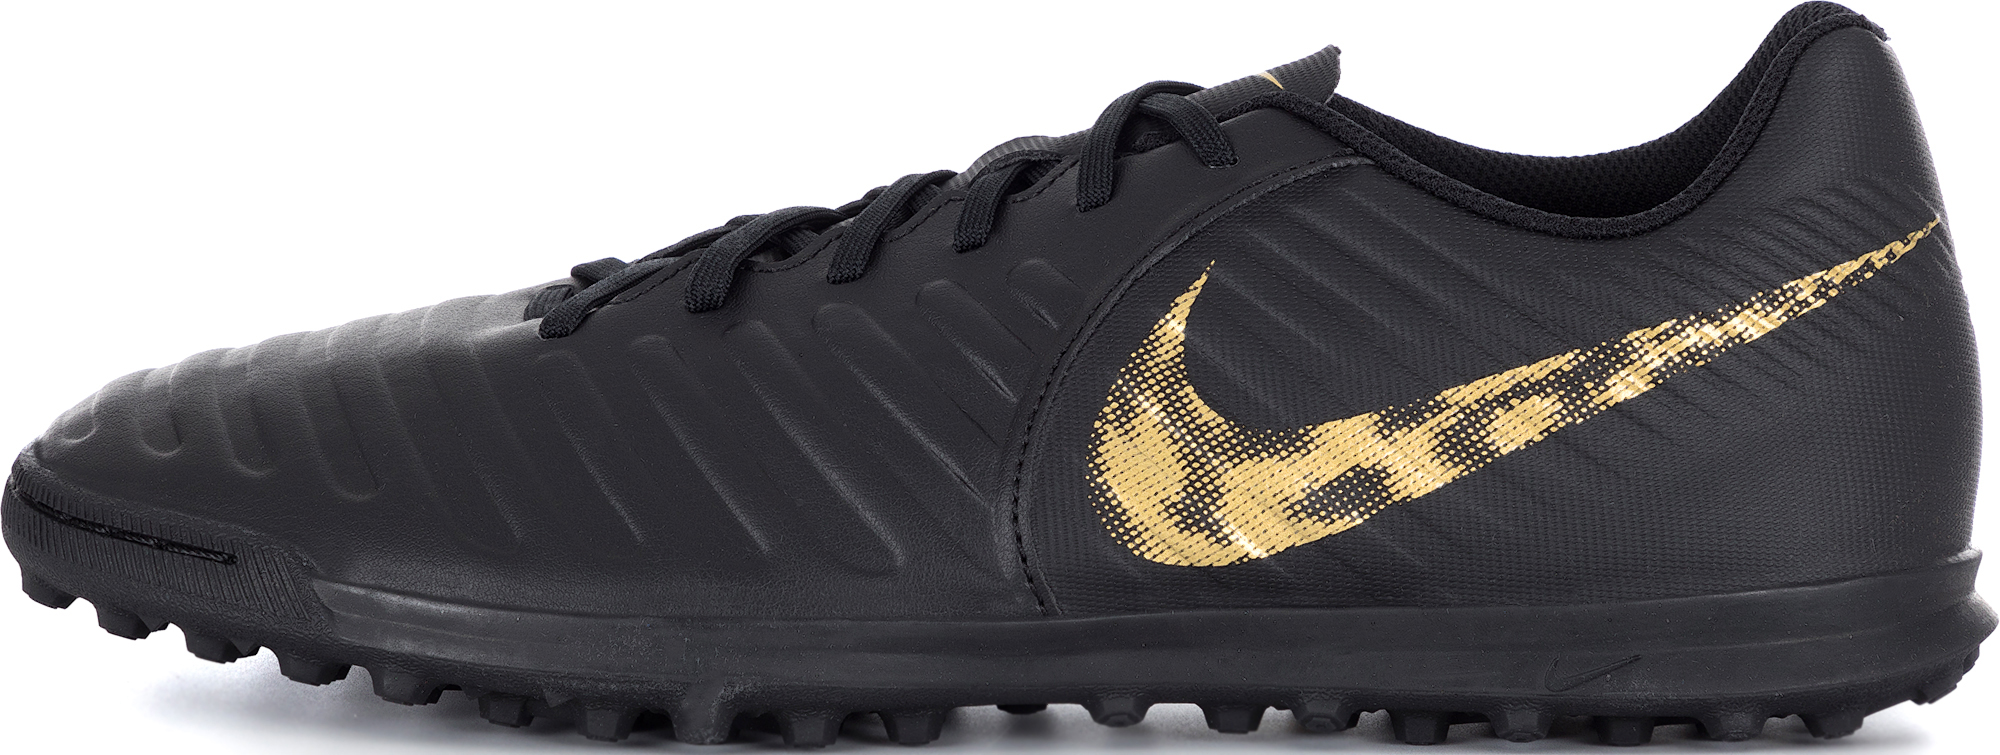 Nike Бутсы мужские Nike Tiempo Legend 7 Club TF, размер 45 цена